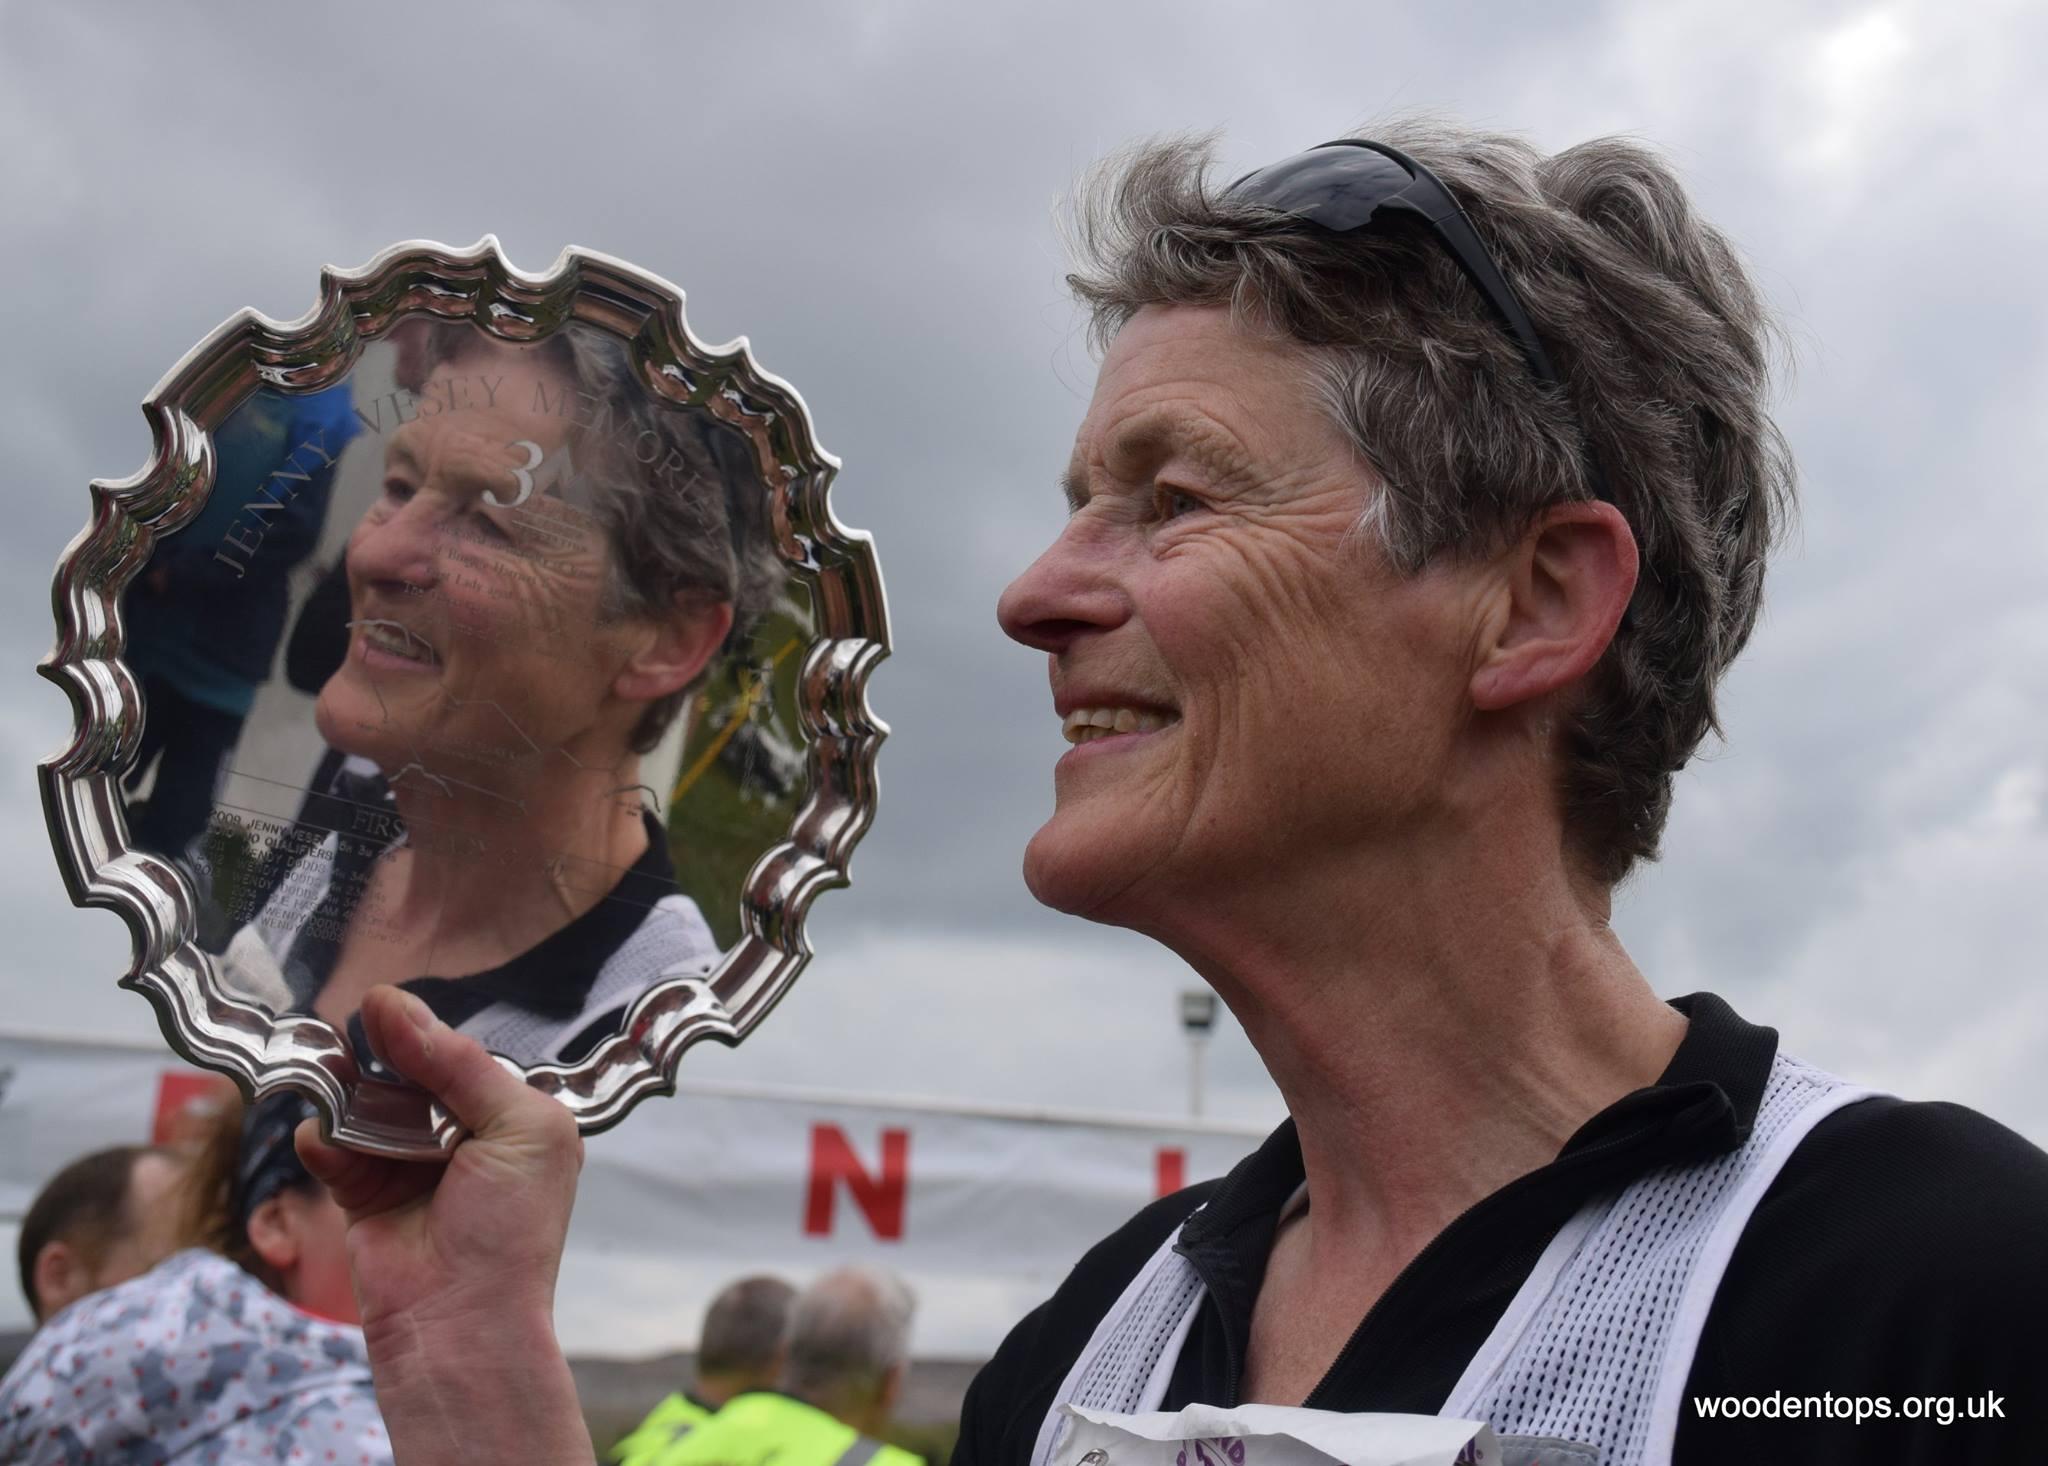 WV60 winner Wendy Dodds. Photo: Woodentops